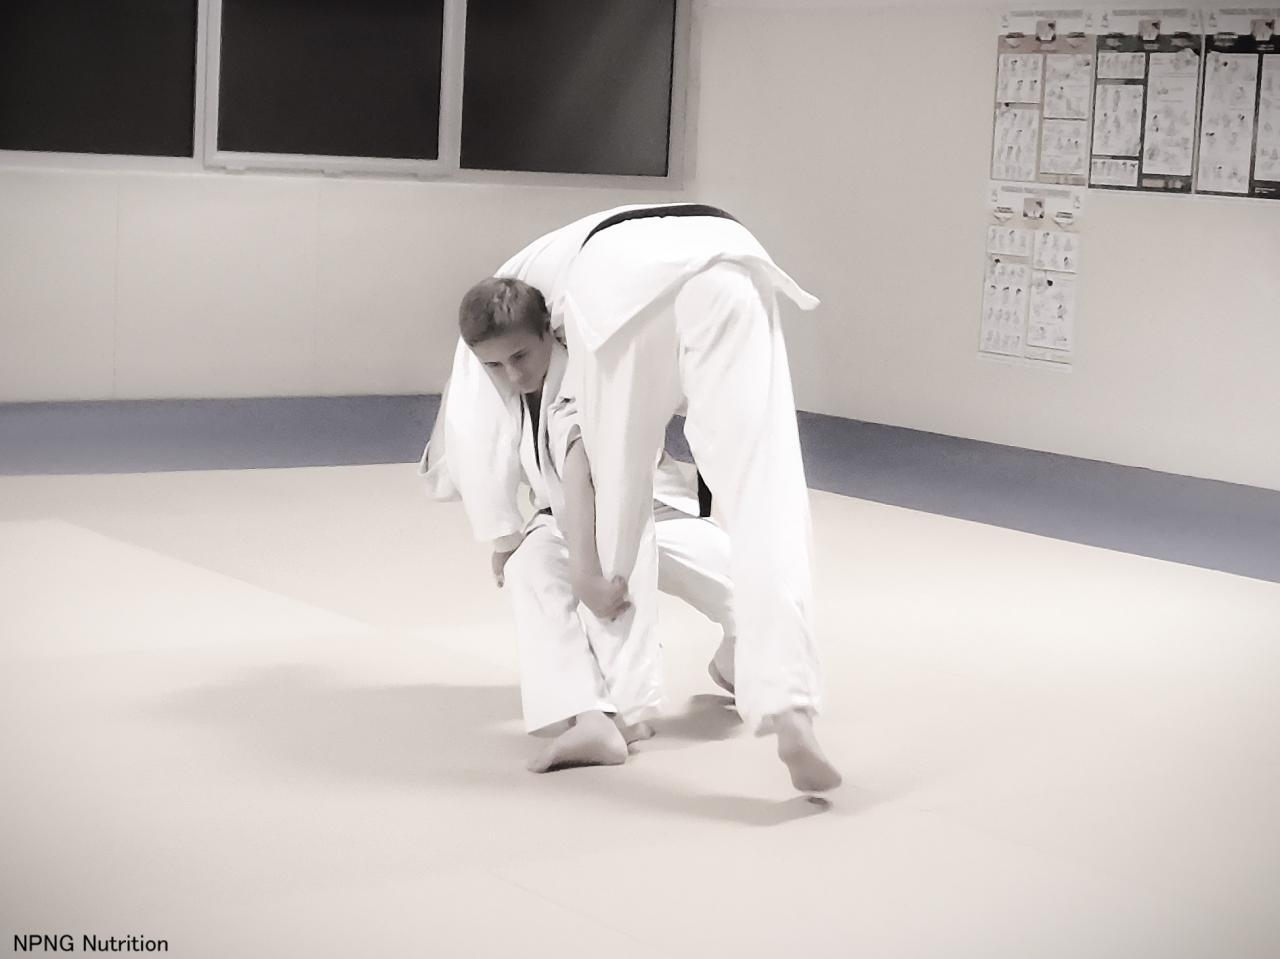 npng-judo-30nov15-yann-st geramin 1  (33)